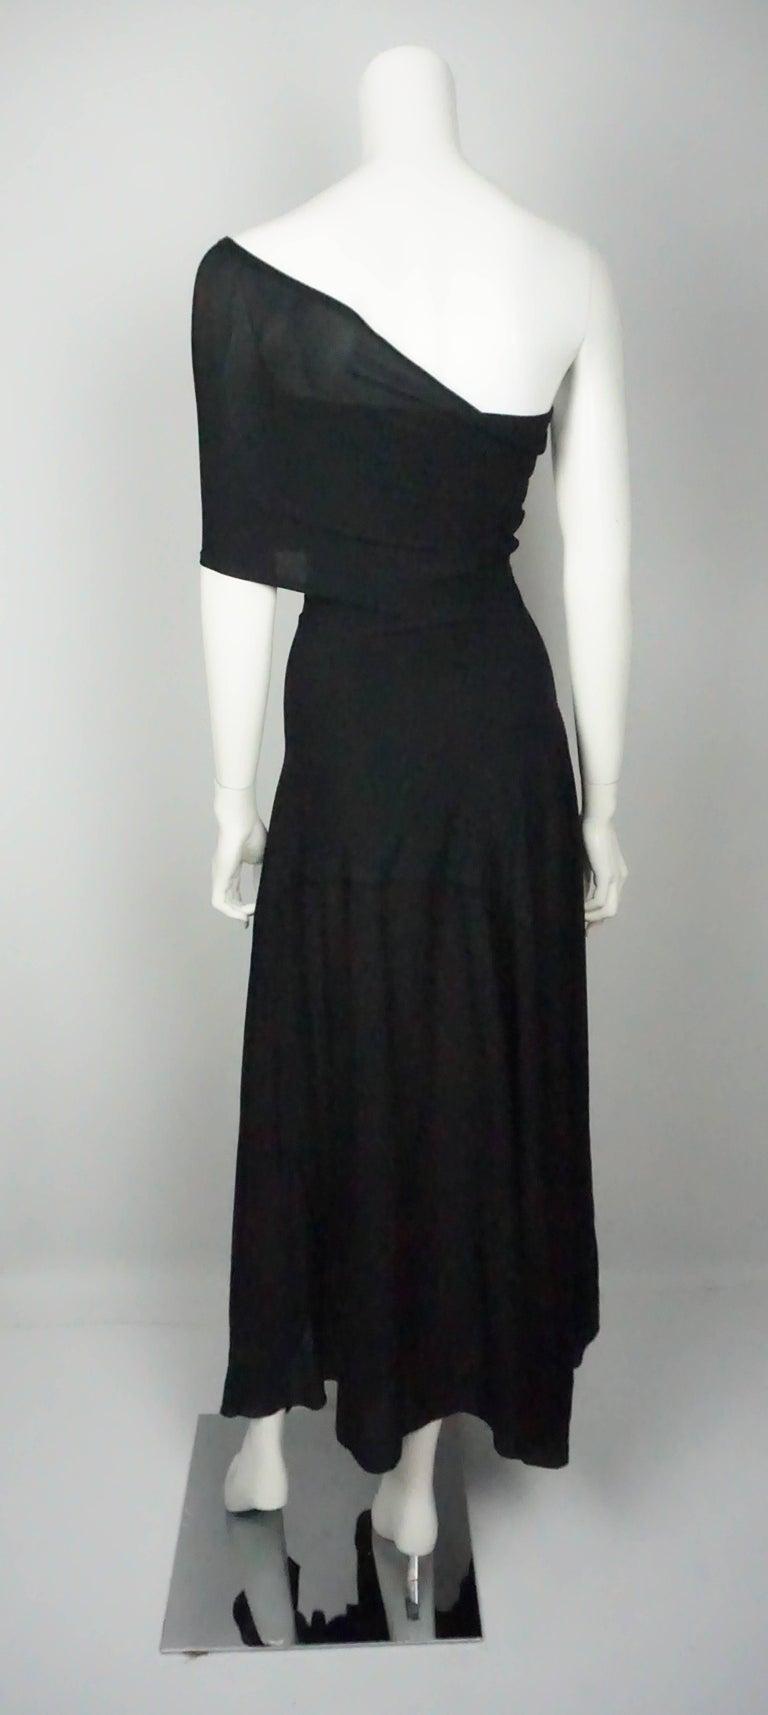 Donna Karan Vintage Black Jersey One Shoulder Dress  In Excellent Condition For Sale In Palm Beach, FL